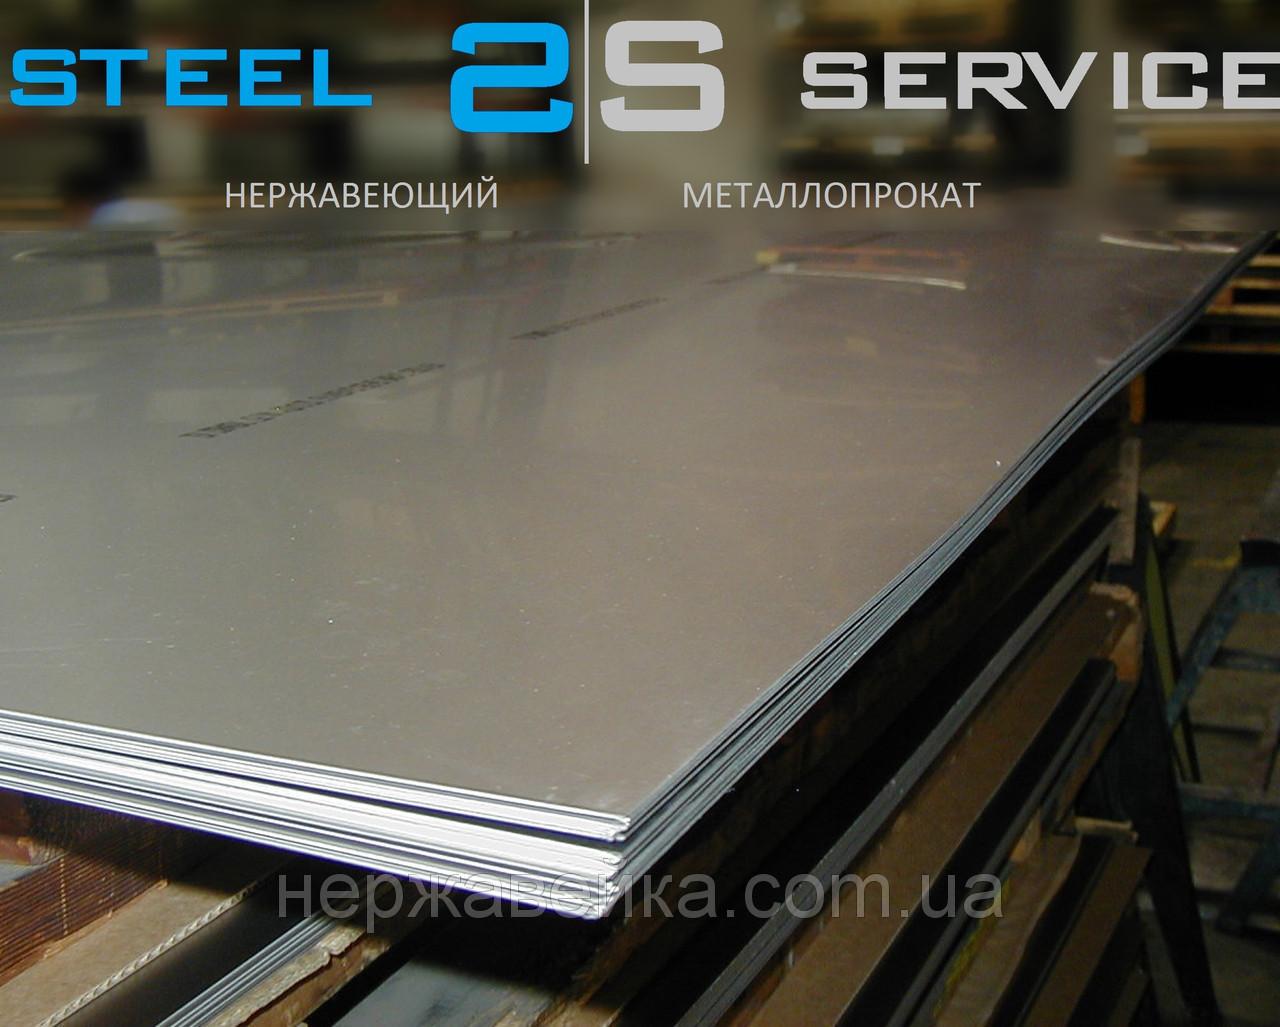 Листовая нержавейка 1,5х1000х2000мм AiSi 201  (12Х15Г9НД) 4N - шлифованный